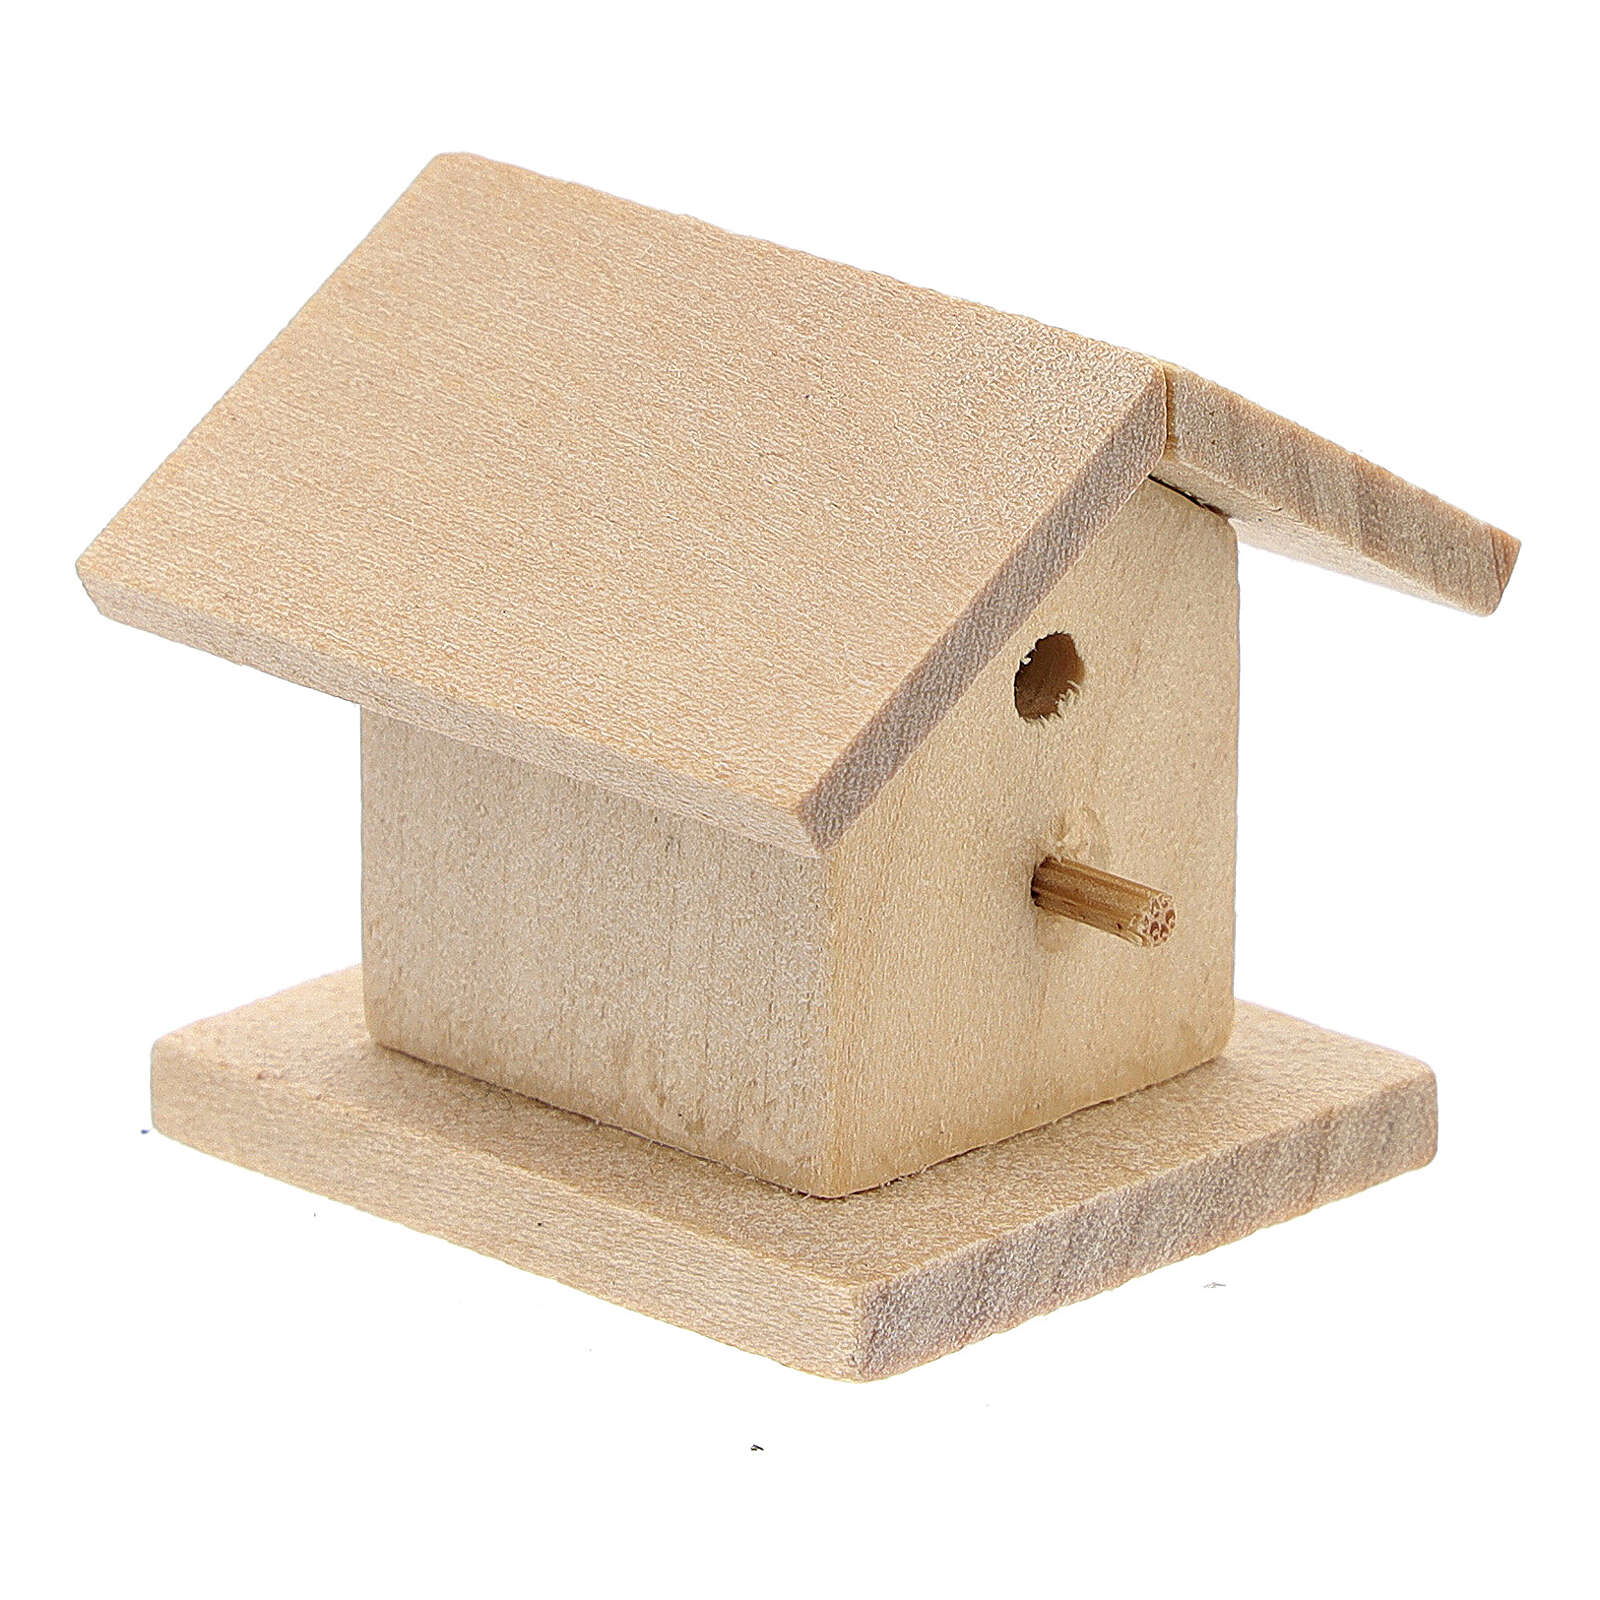 Miniature bird house, 8-10 cm nativity 3